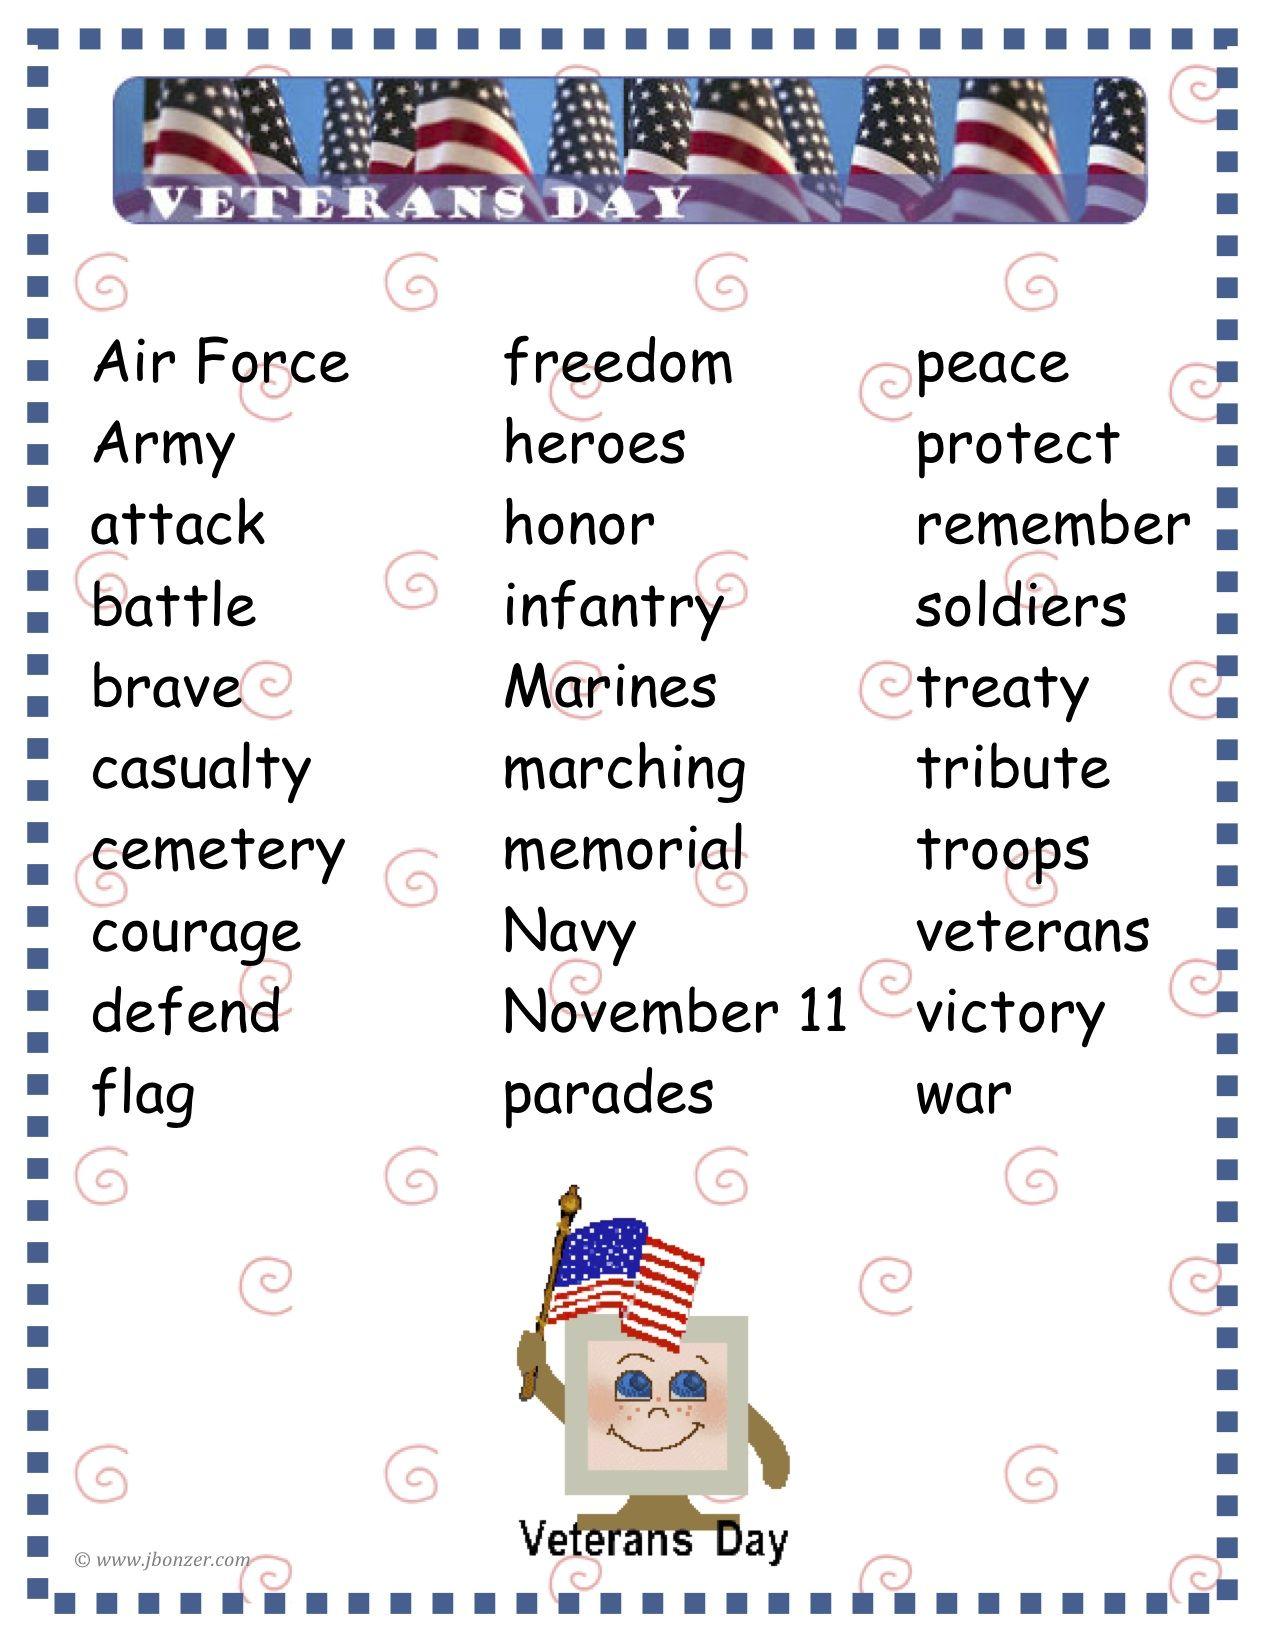 Veteransdayposterbyjudybonzer 1 275 1 651 Pixels